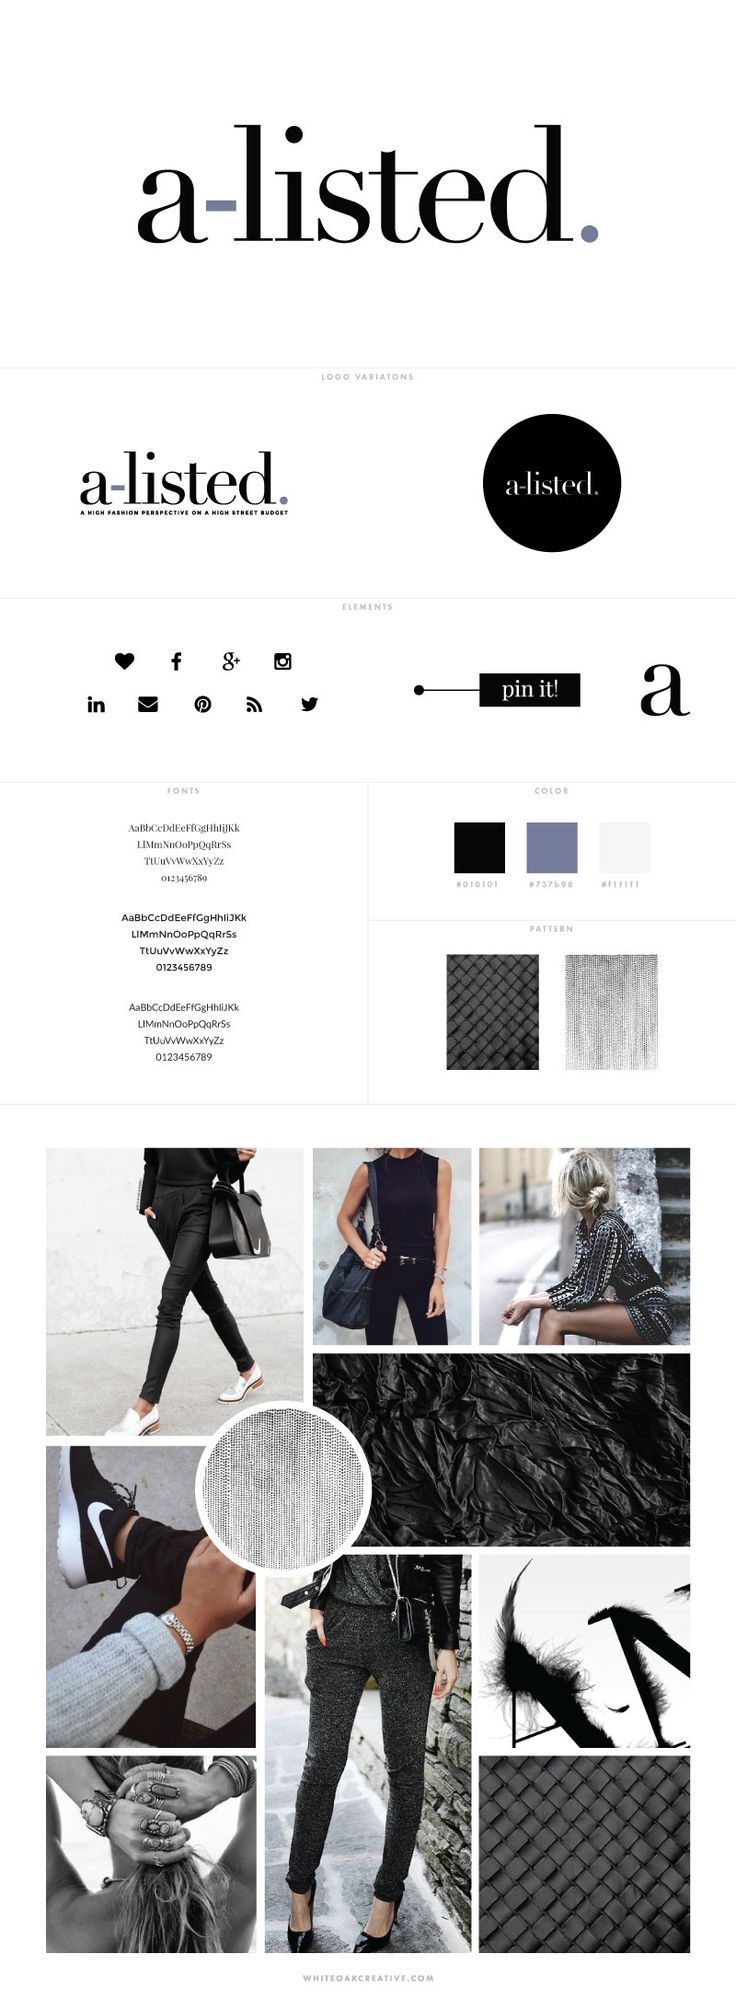 AListed Fashion Blog Design by White Oak Creative logo